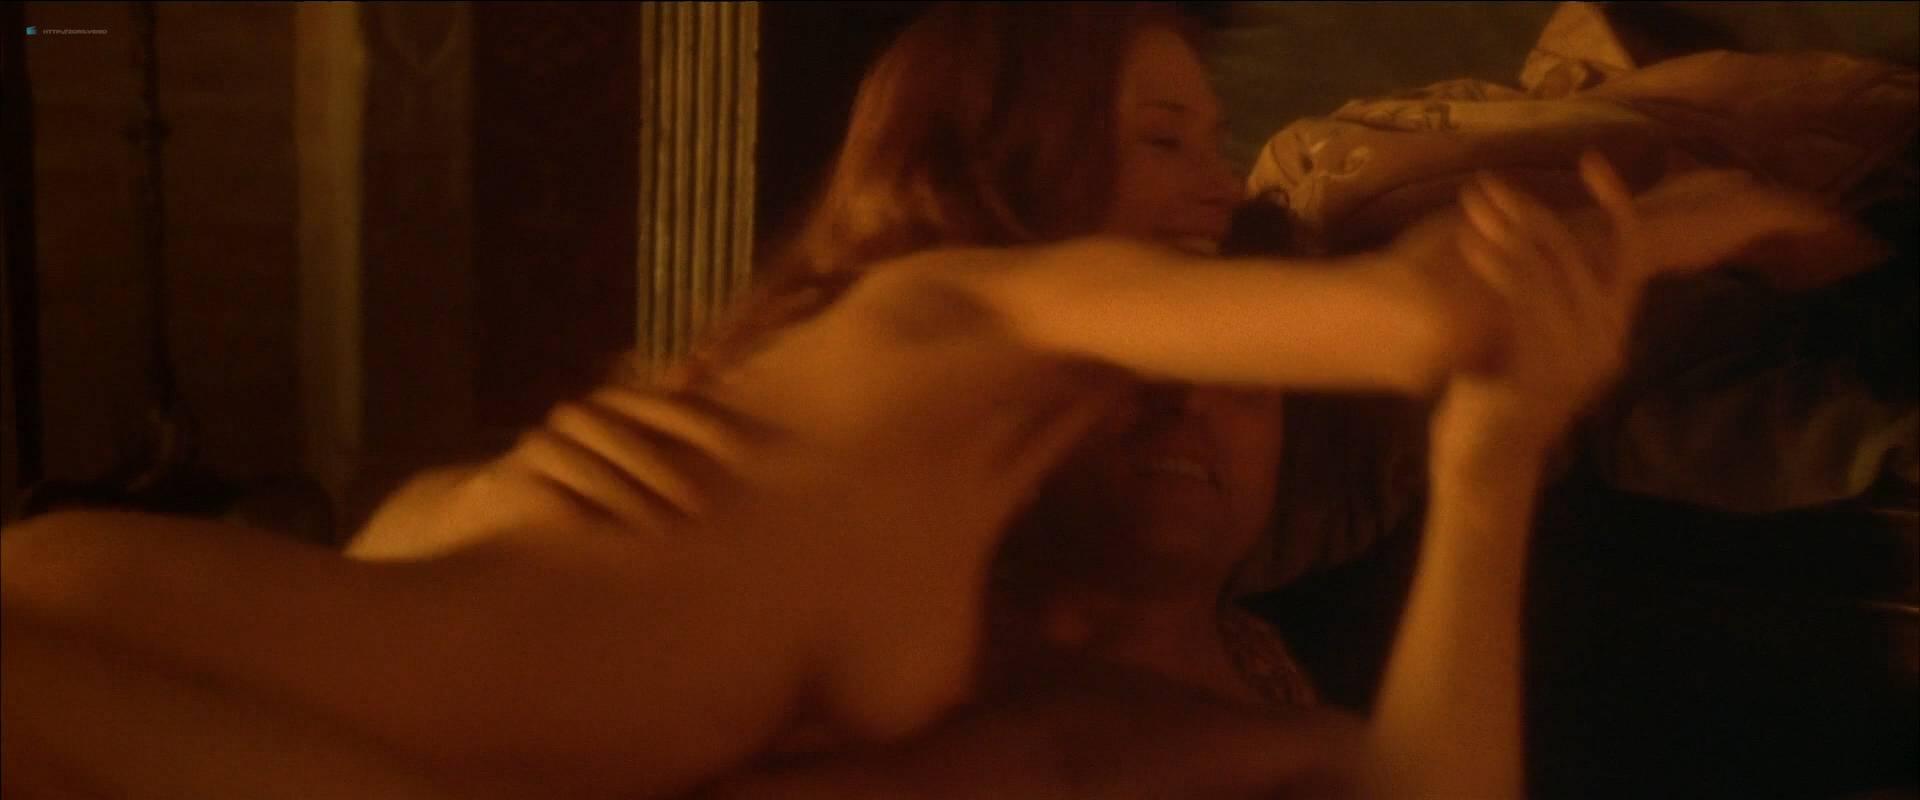 Catherine mccormack sample sex video